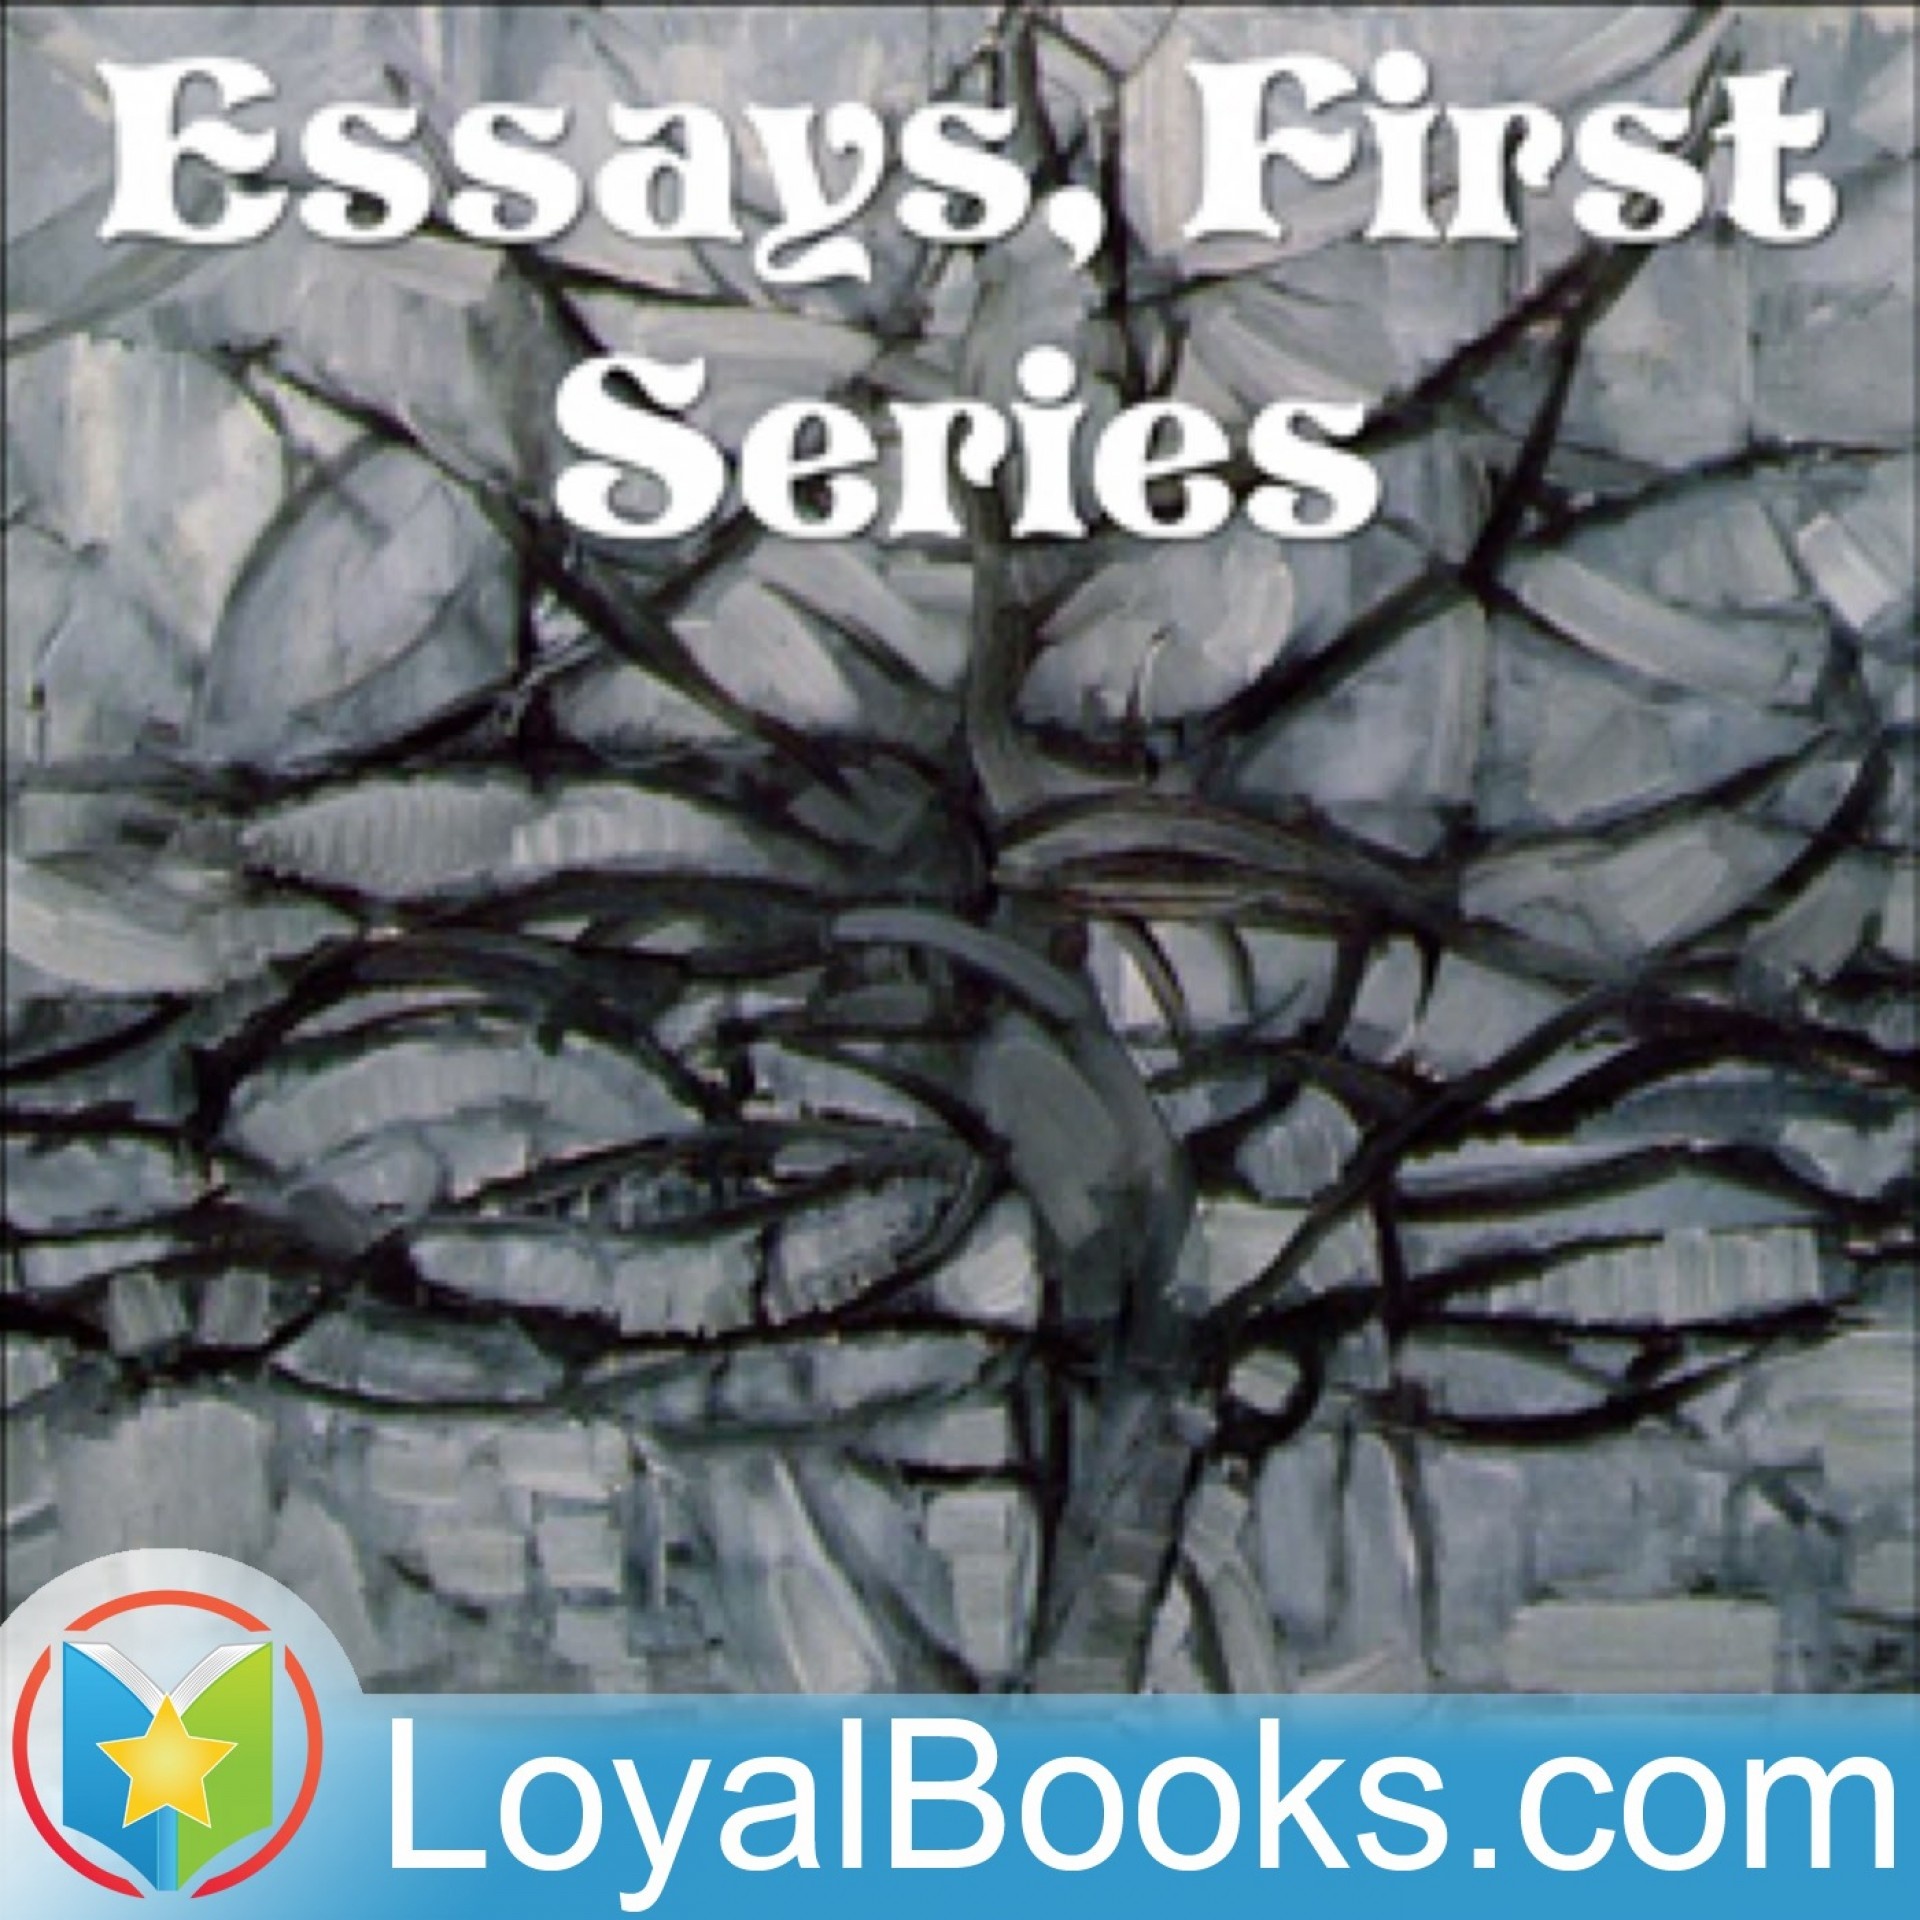 015 Essay Example Essays First Series By Ralph Waldo Stunning In Zen Buddhism Emerson's Value 1920